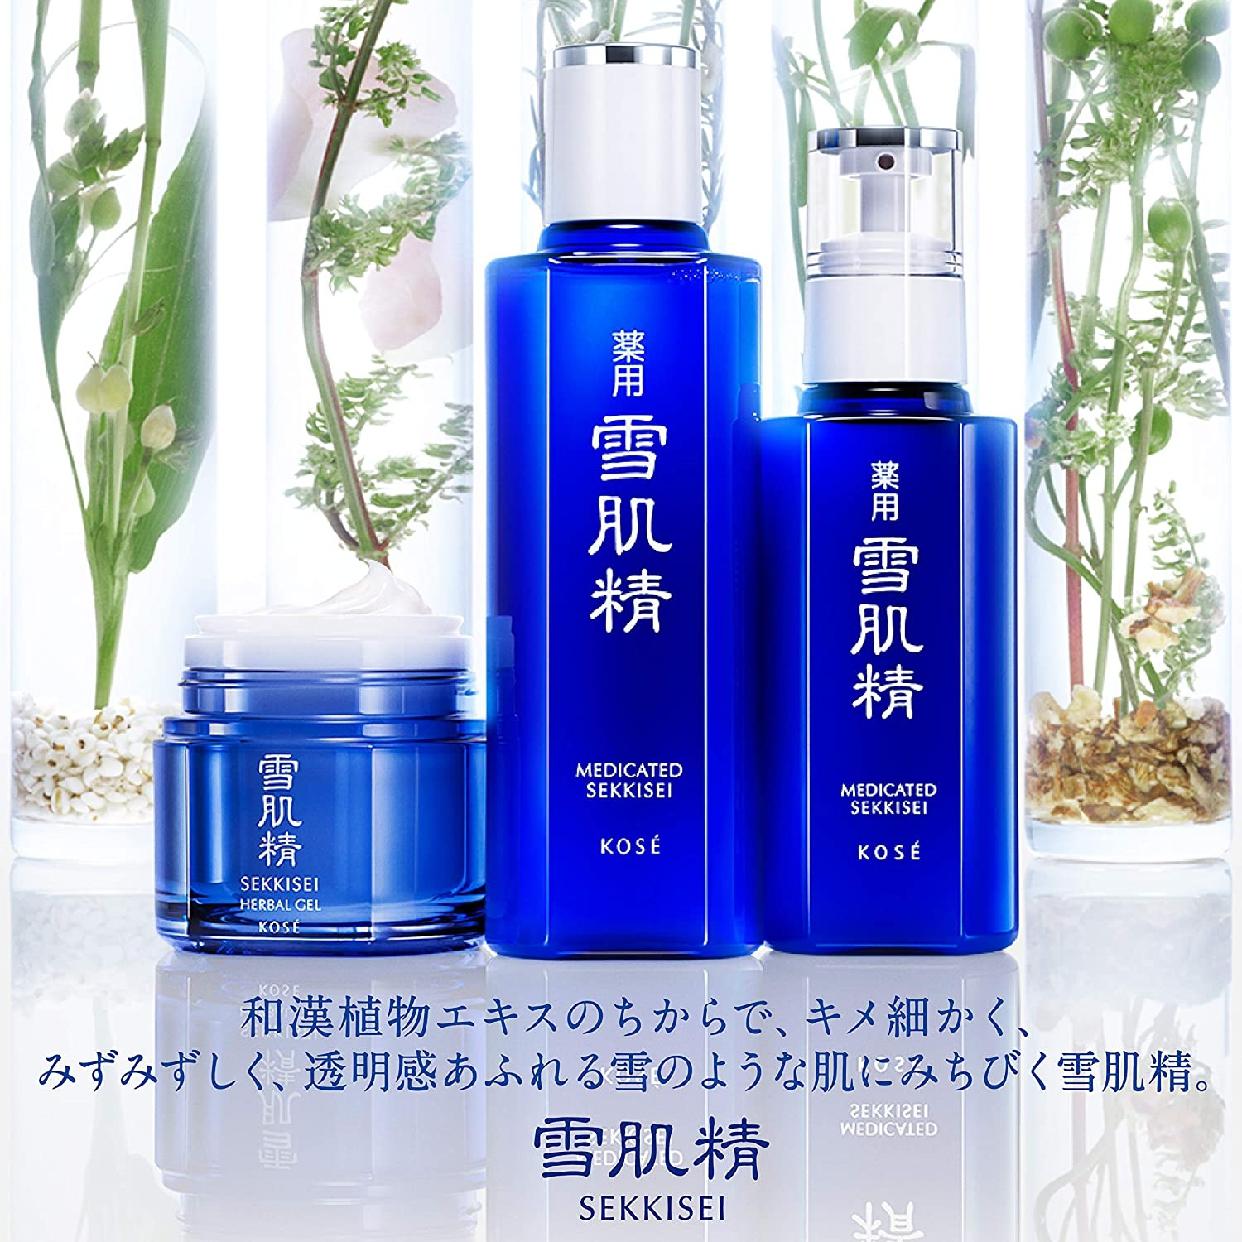 雪肌精(SEKKISEI) 薬用 雪肌精 乳液の商品画像9